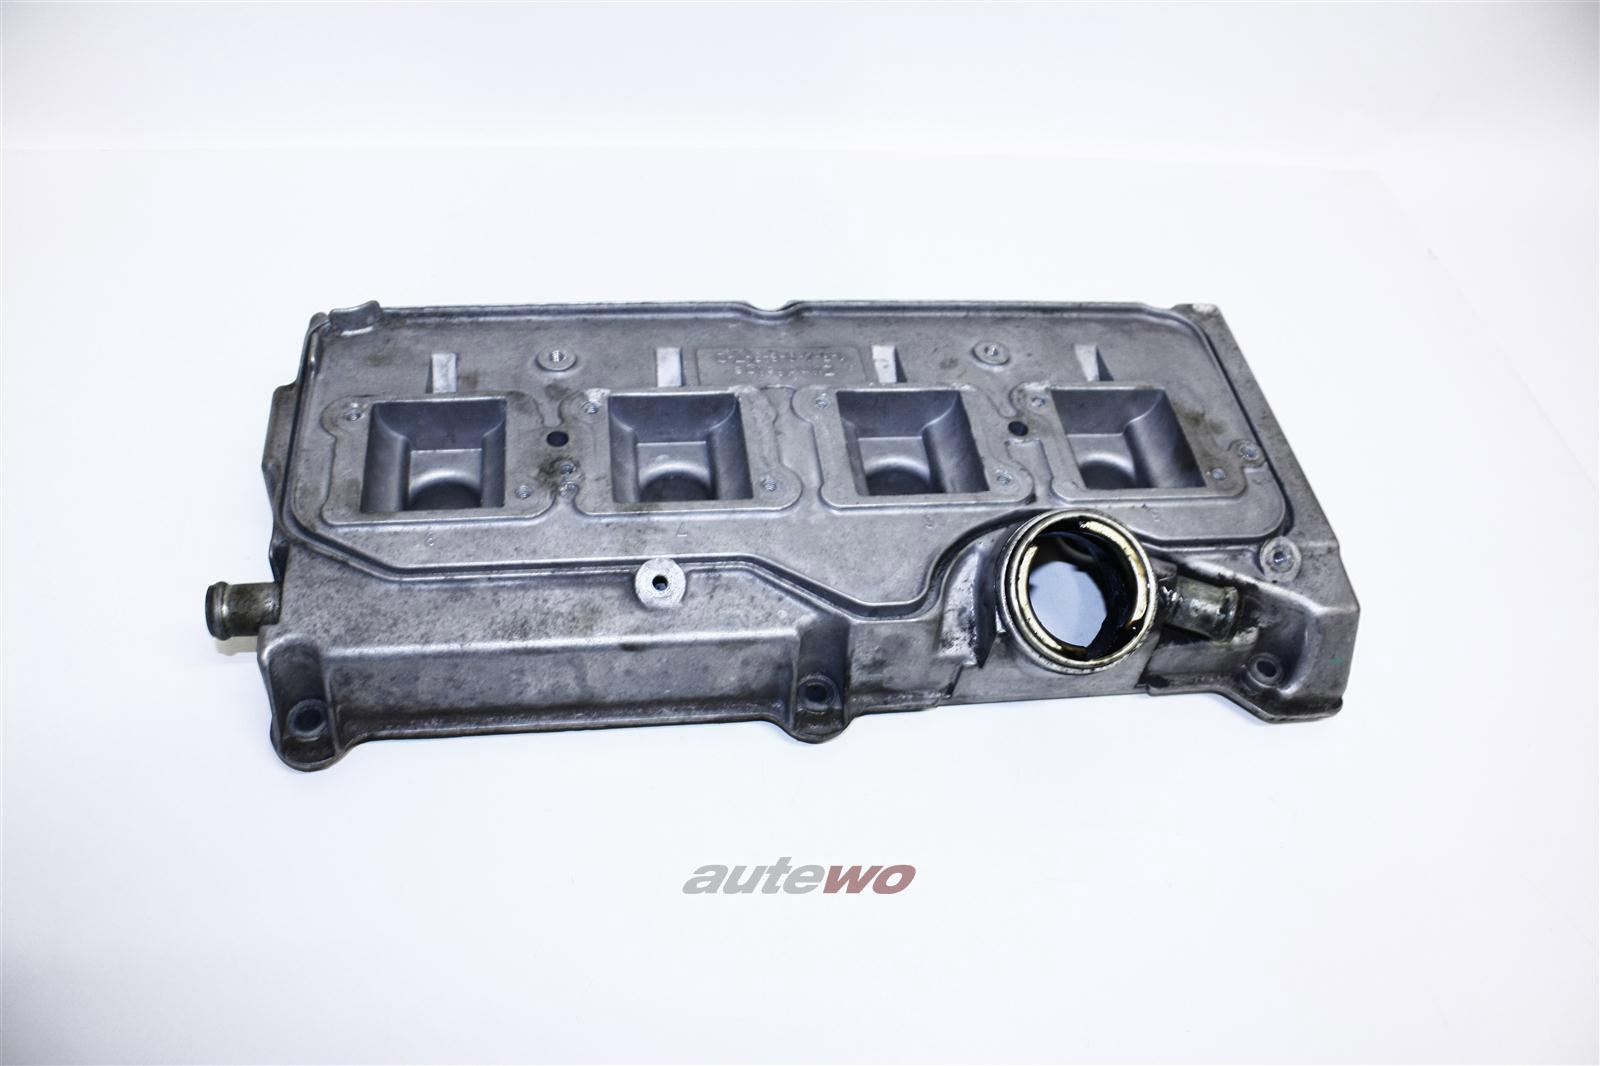 Audi S6+ C4/A8 D2 3.7-4.2l V8 Ventildeckel Links 077103471F